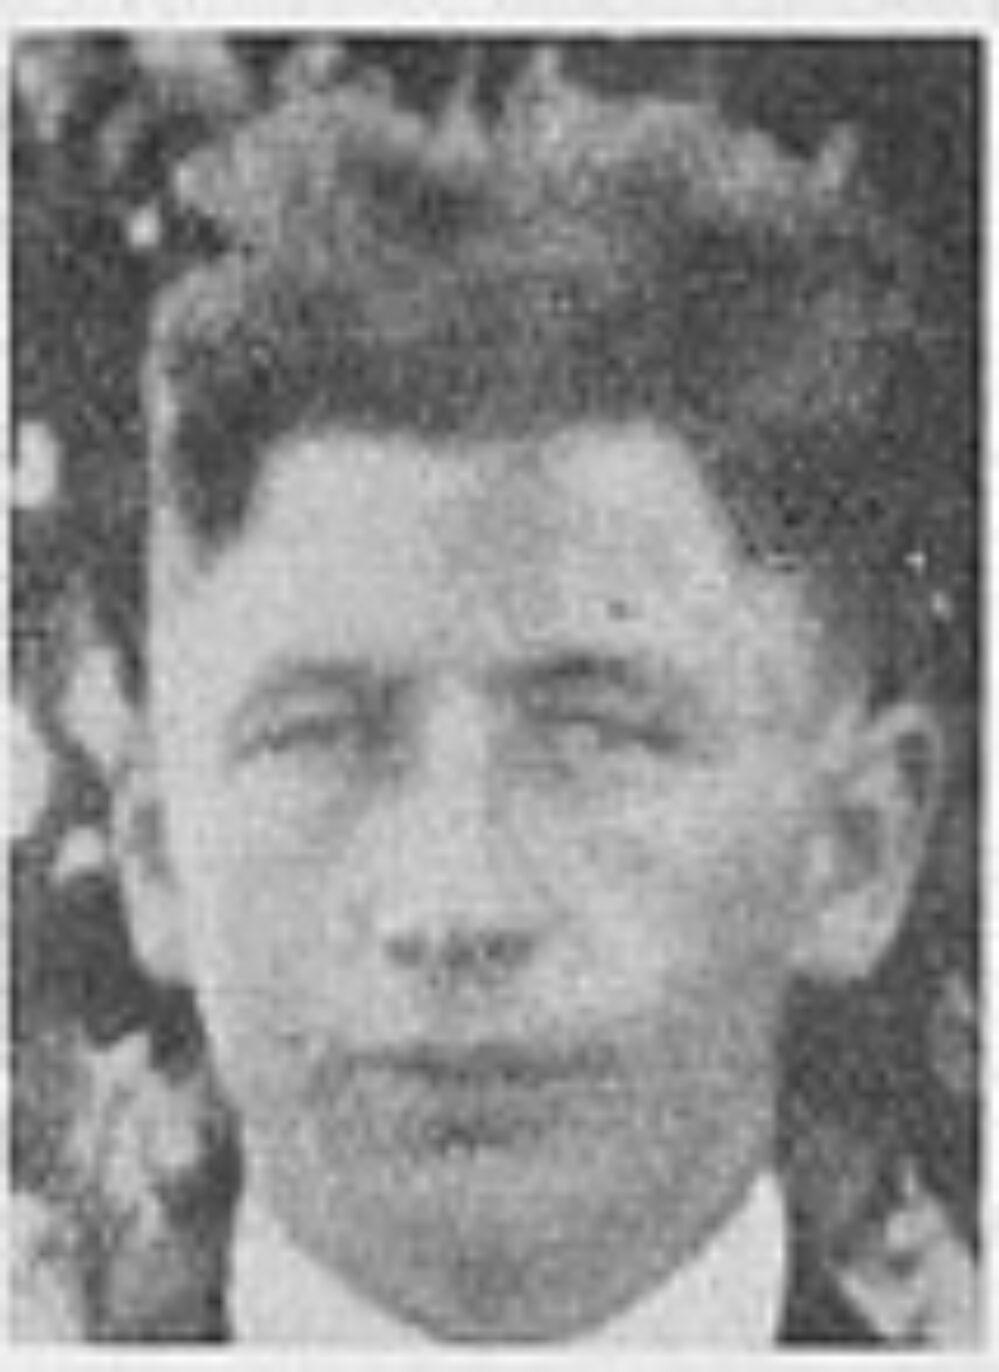 Harald Eugen Johansen